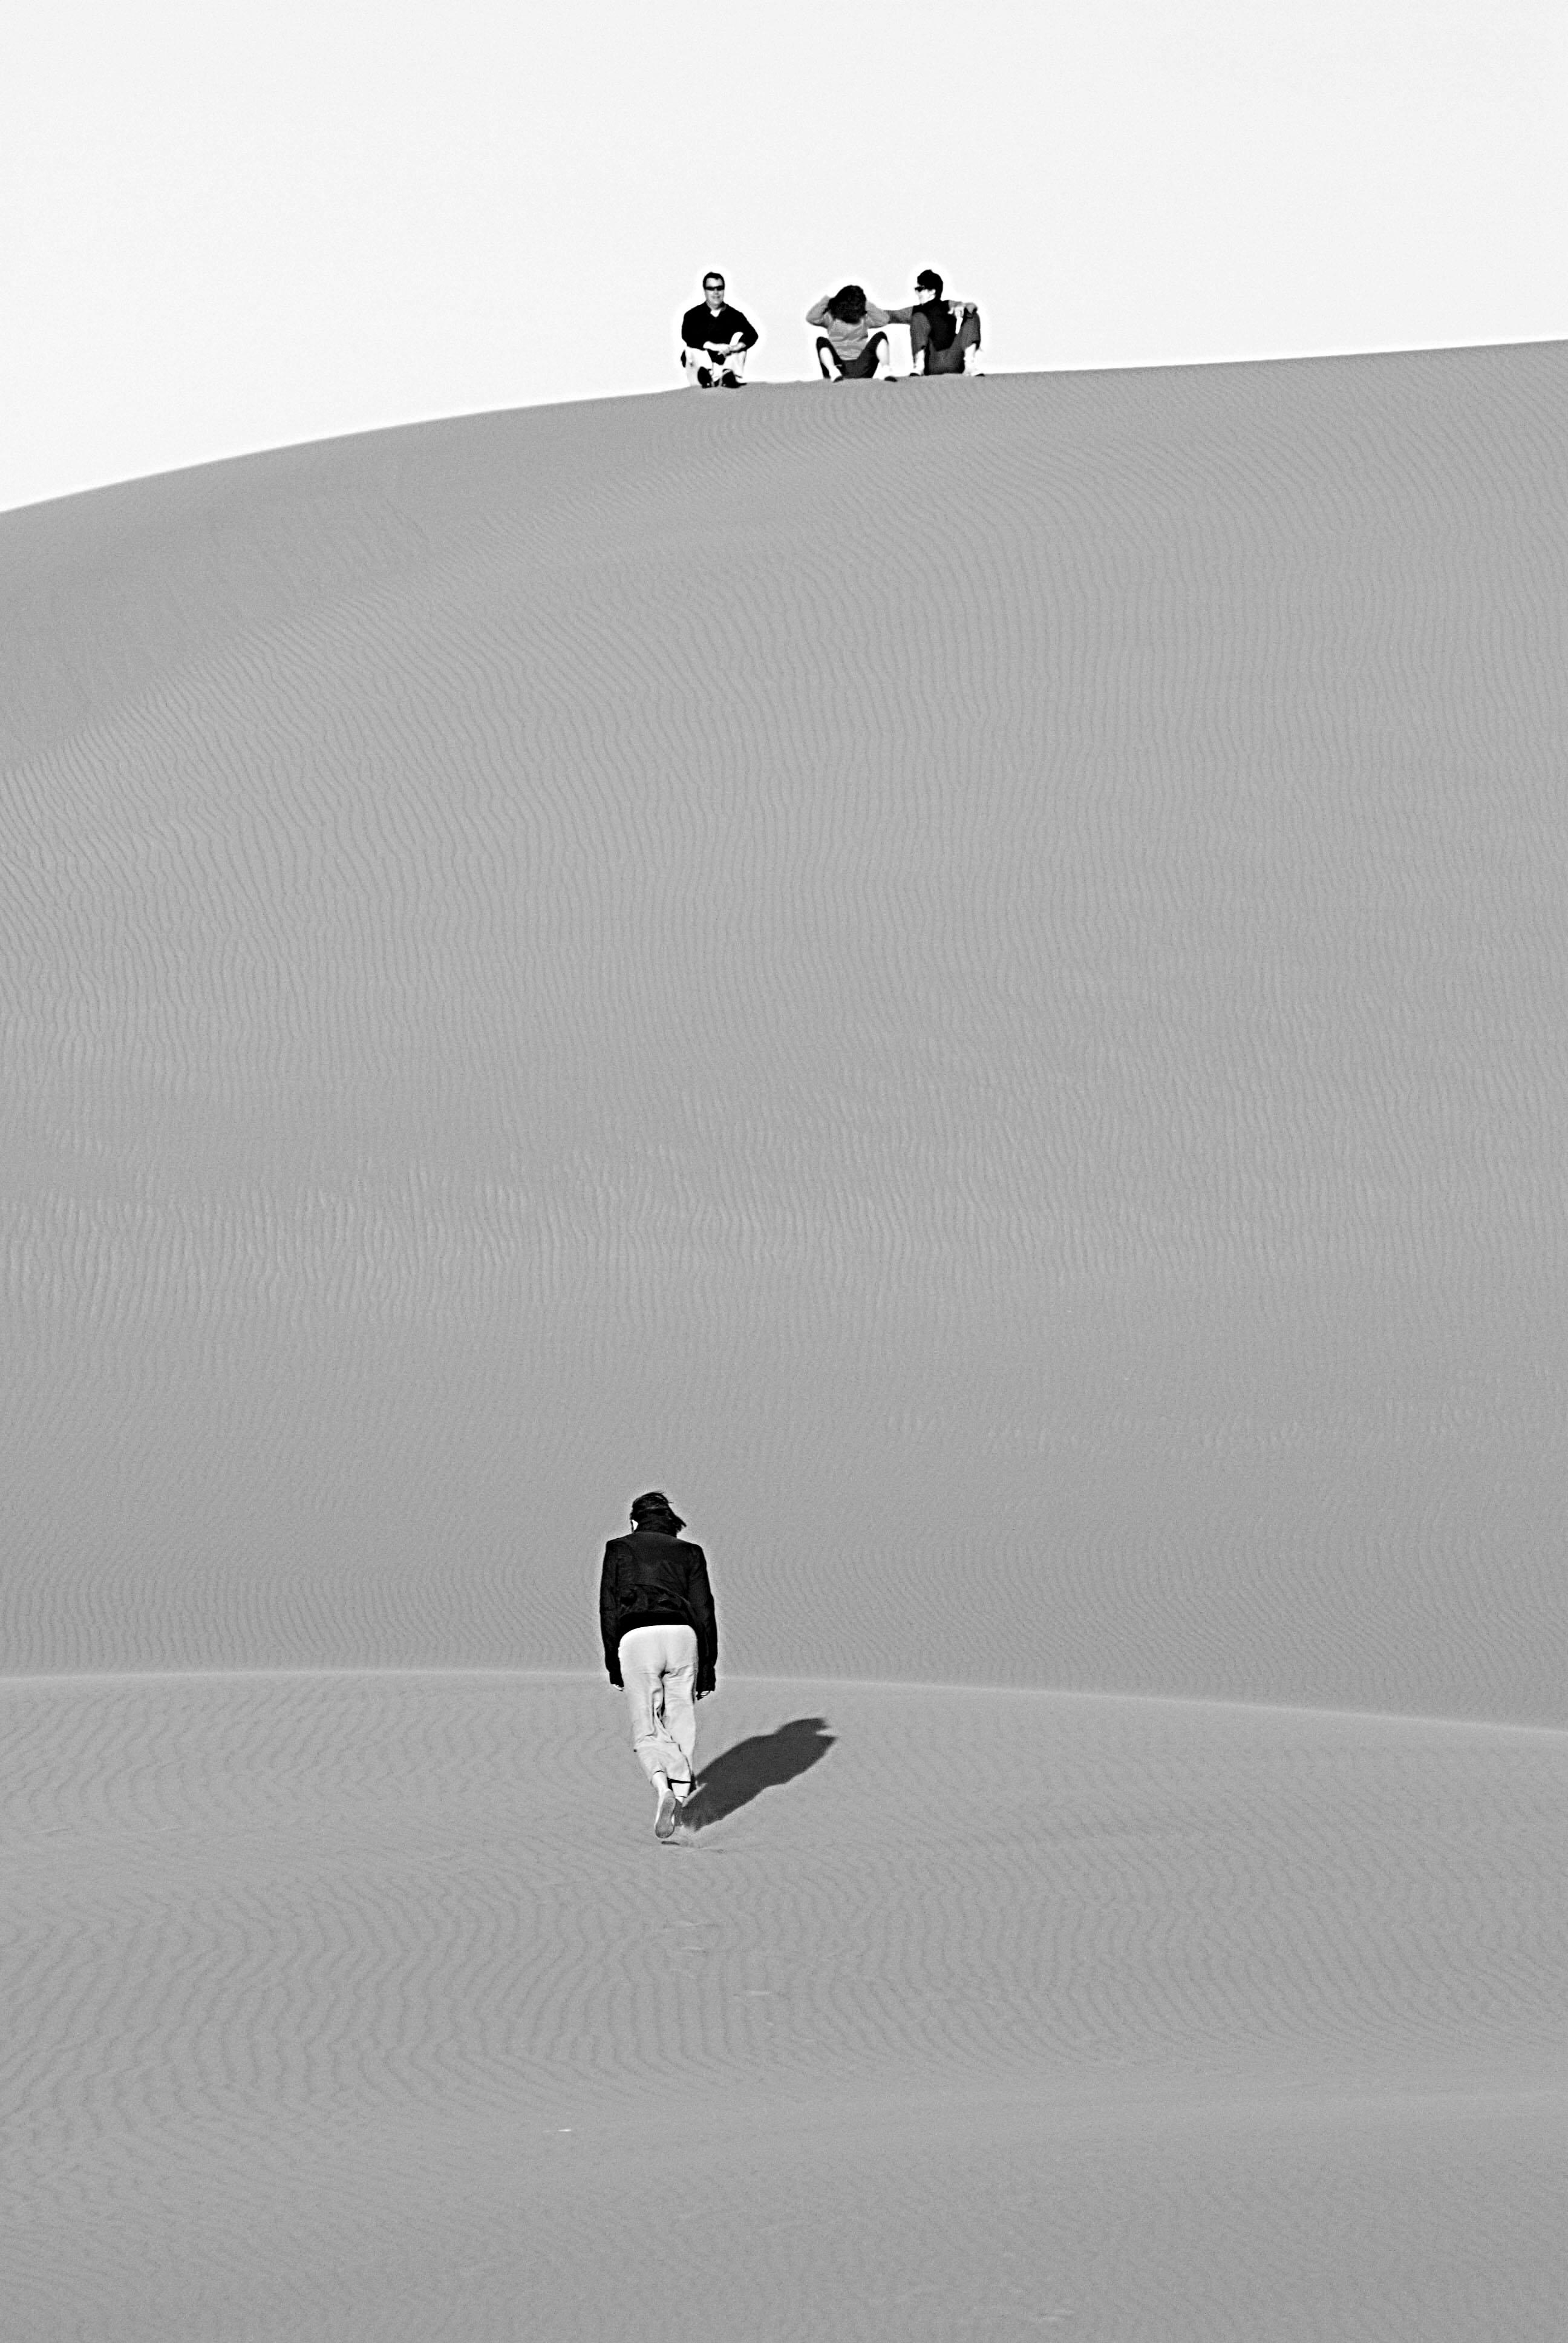 Monter une dune _ Merzouga